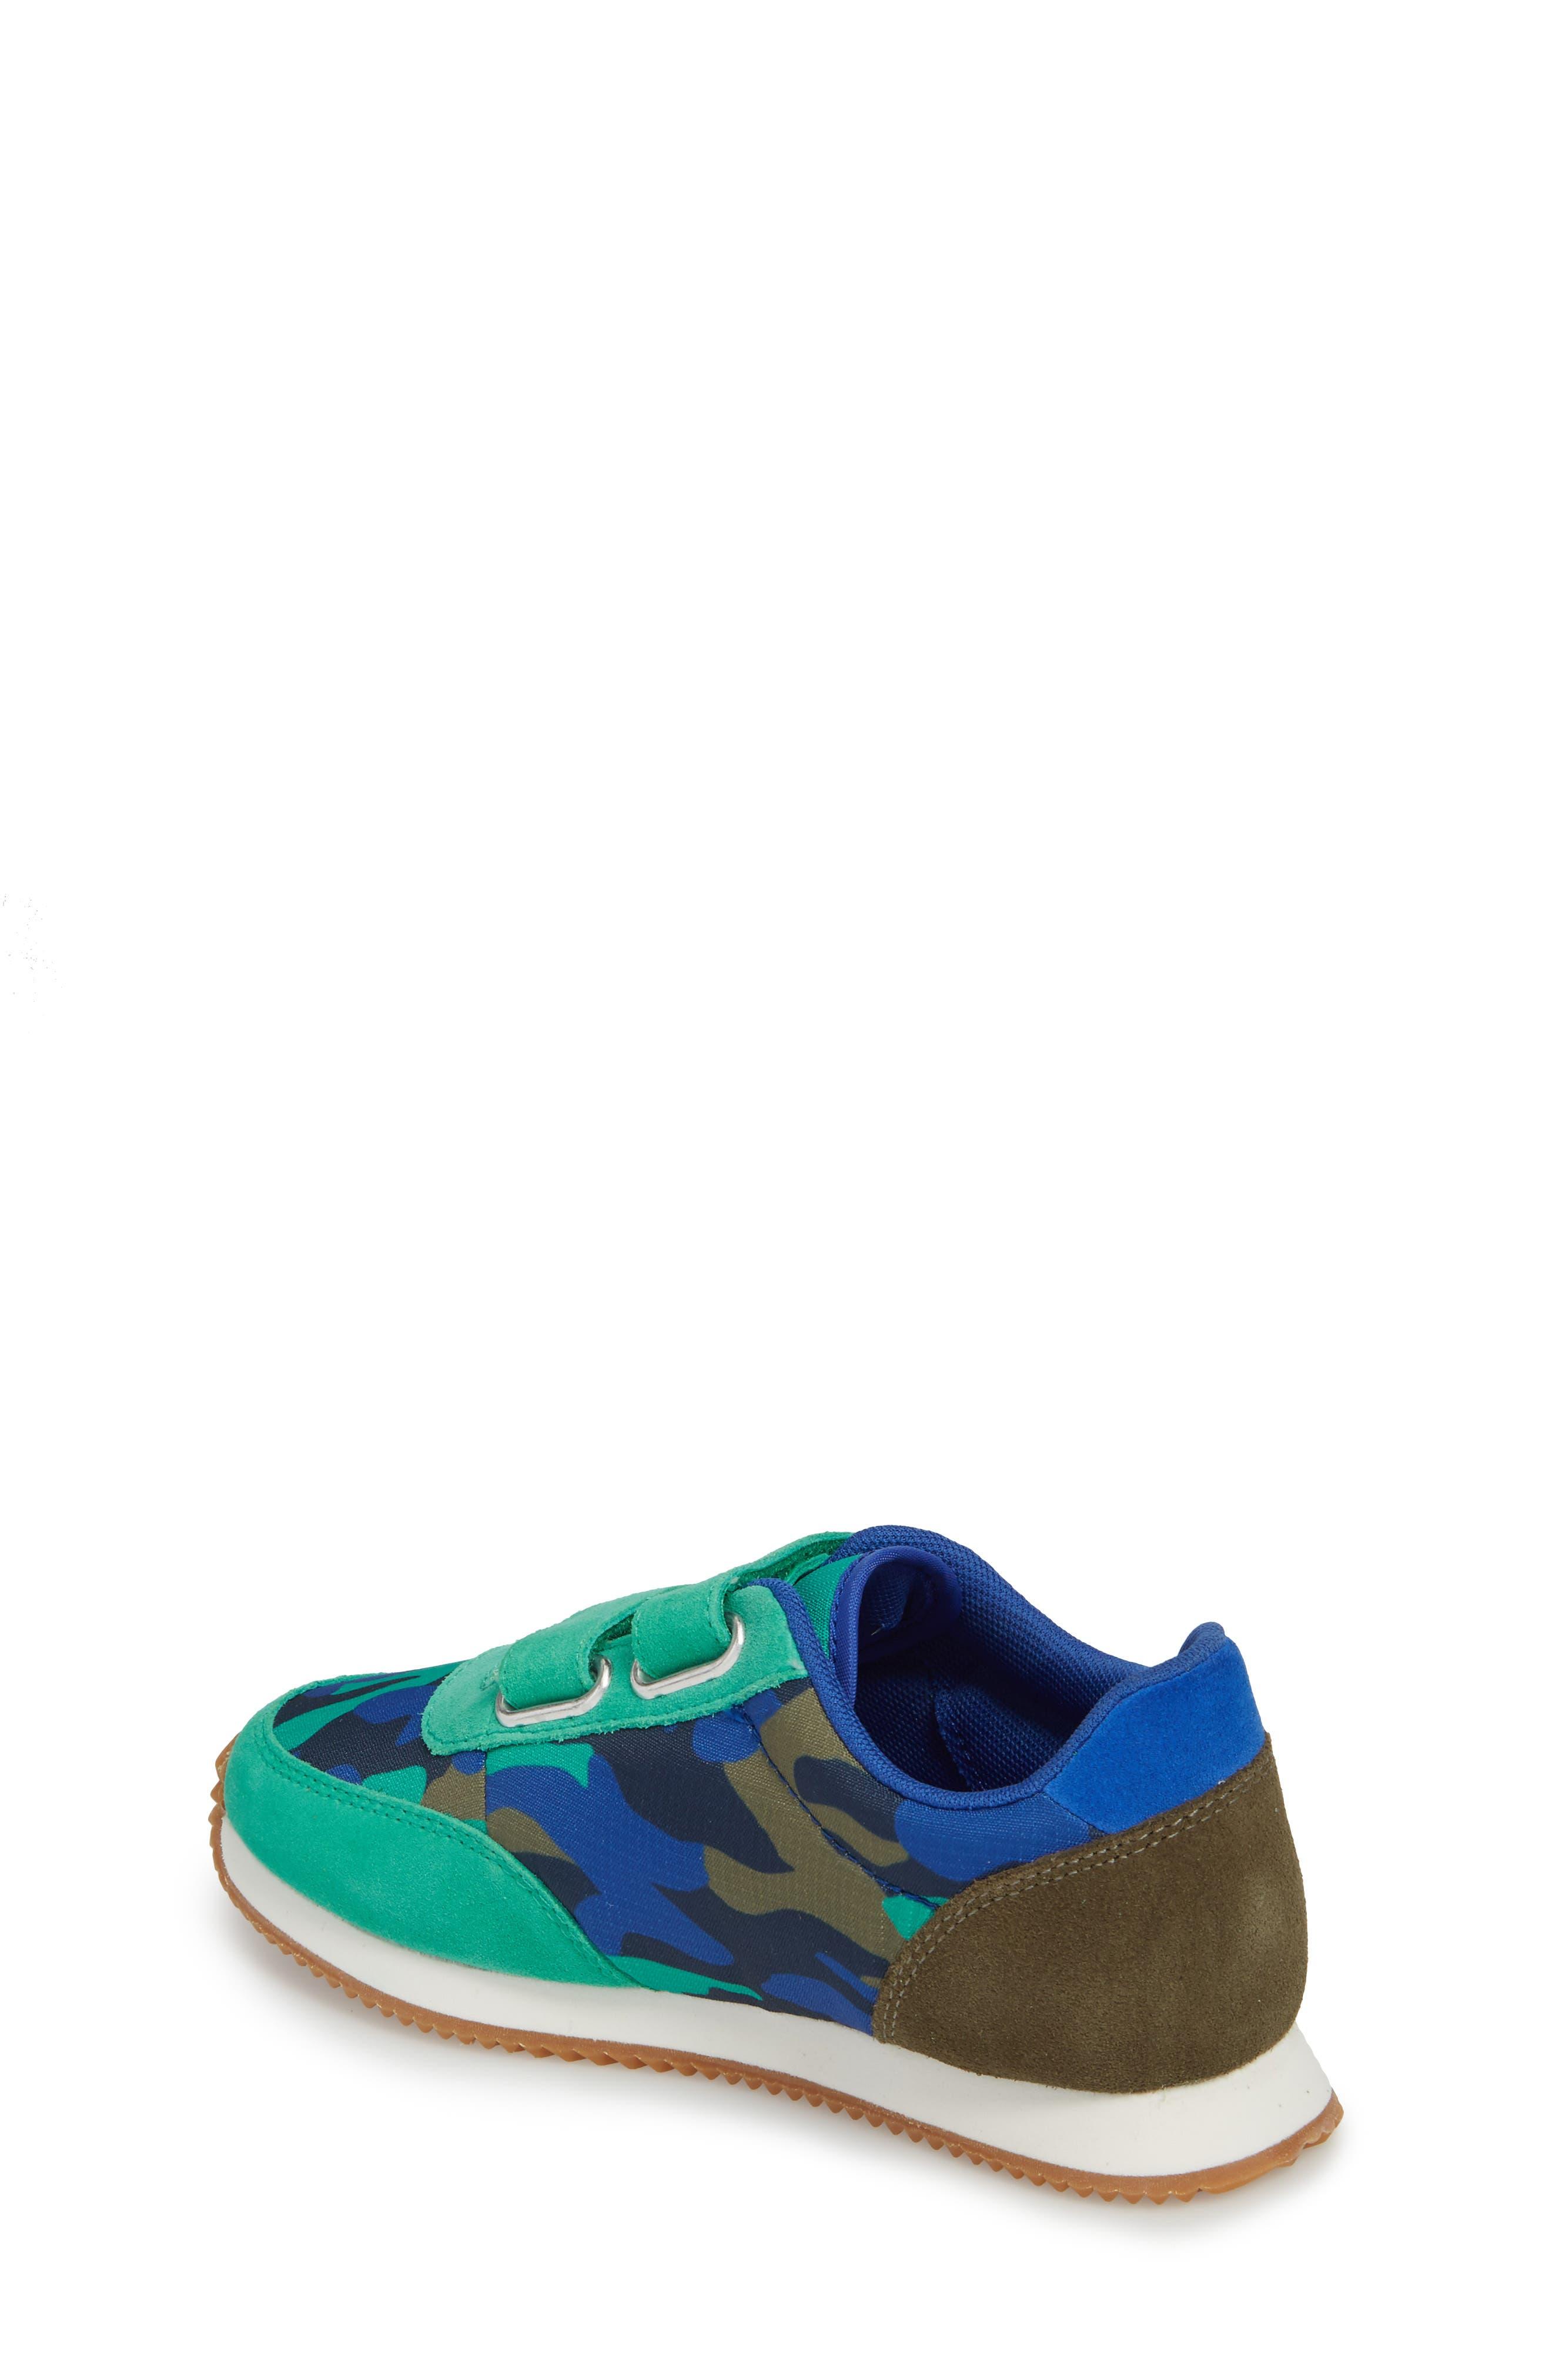 Print Sneakers,                             Alternate thumbnail 2, color,                             315